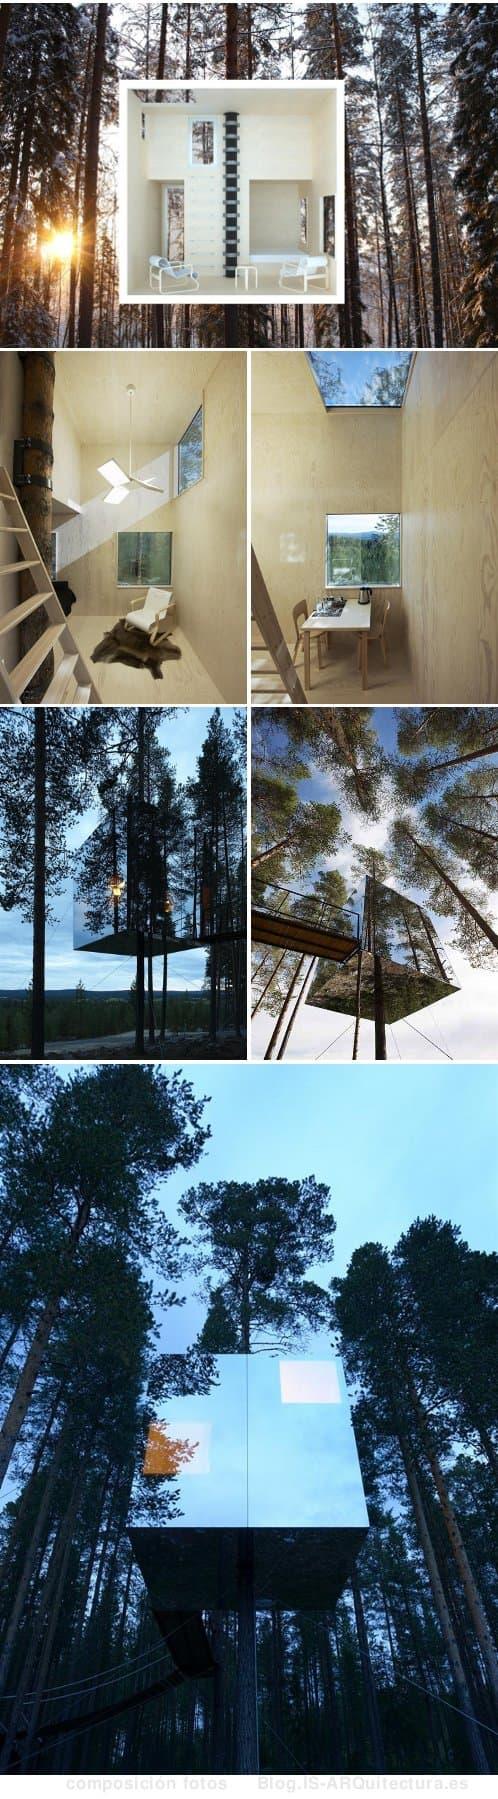 refugio-mirror-cube-treehotel